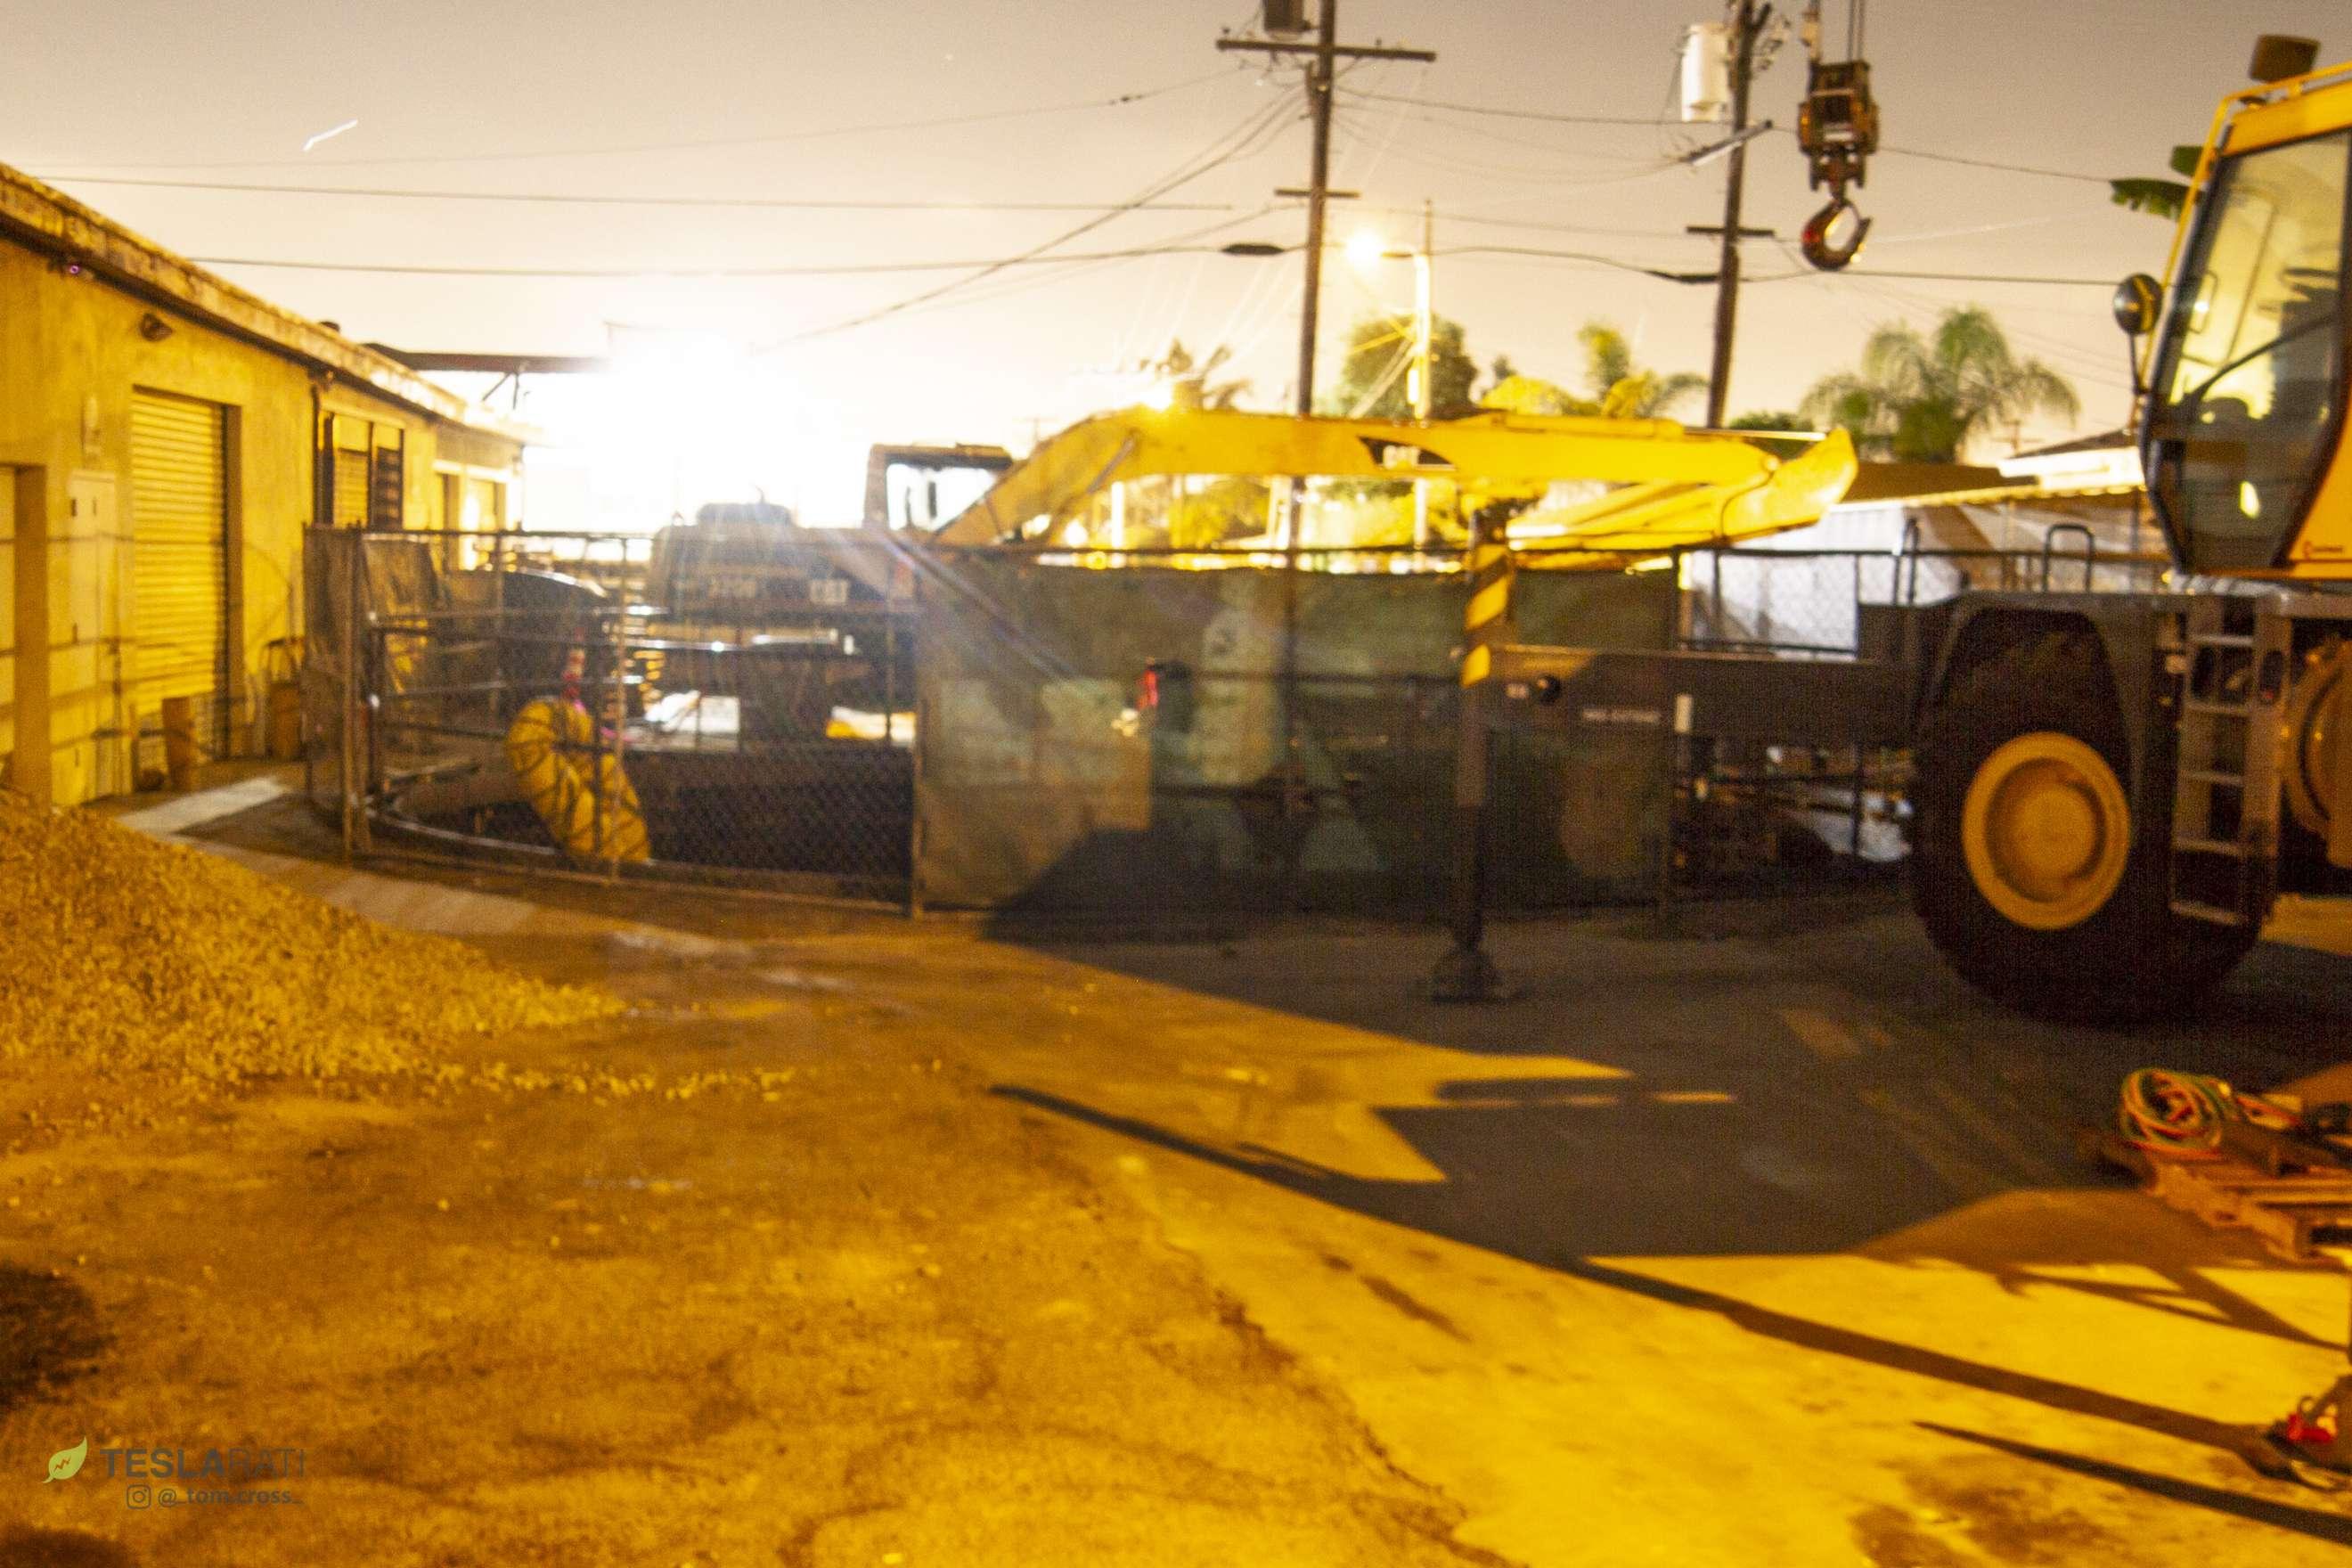 TBC garage and TBM exit site (Tom Cross) 2(c)